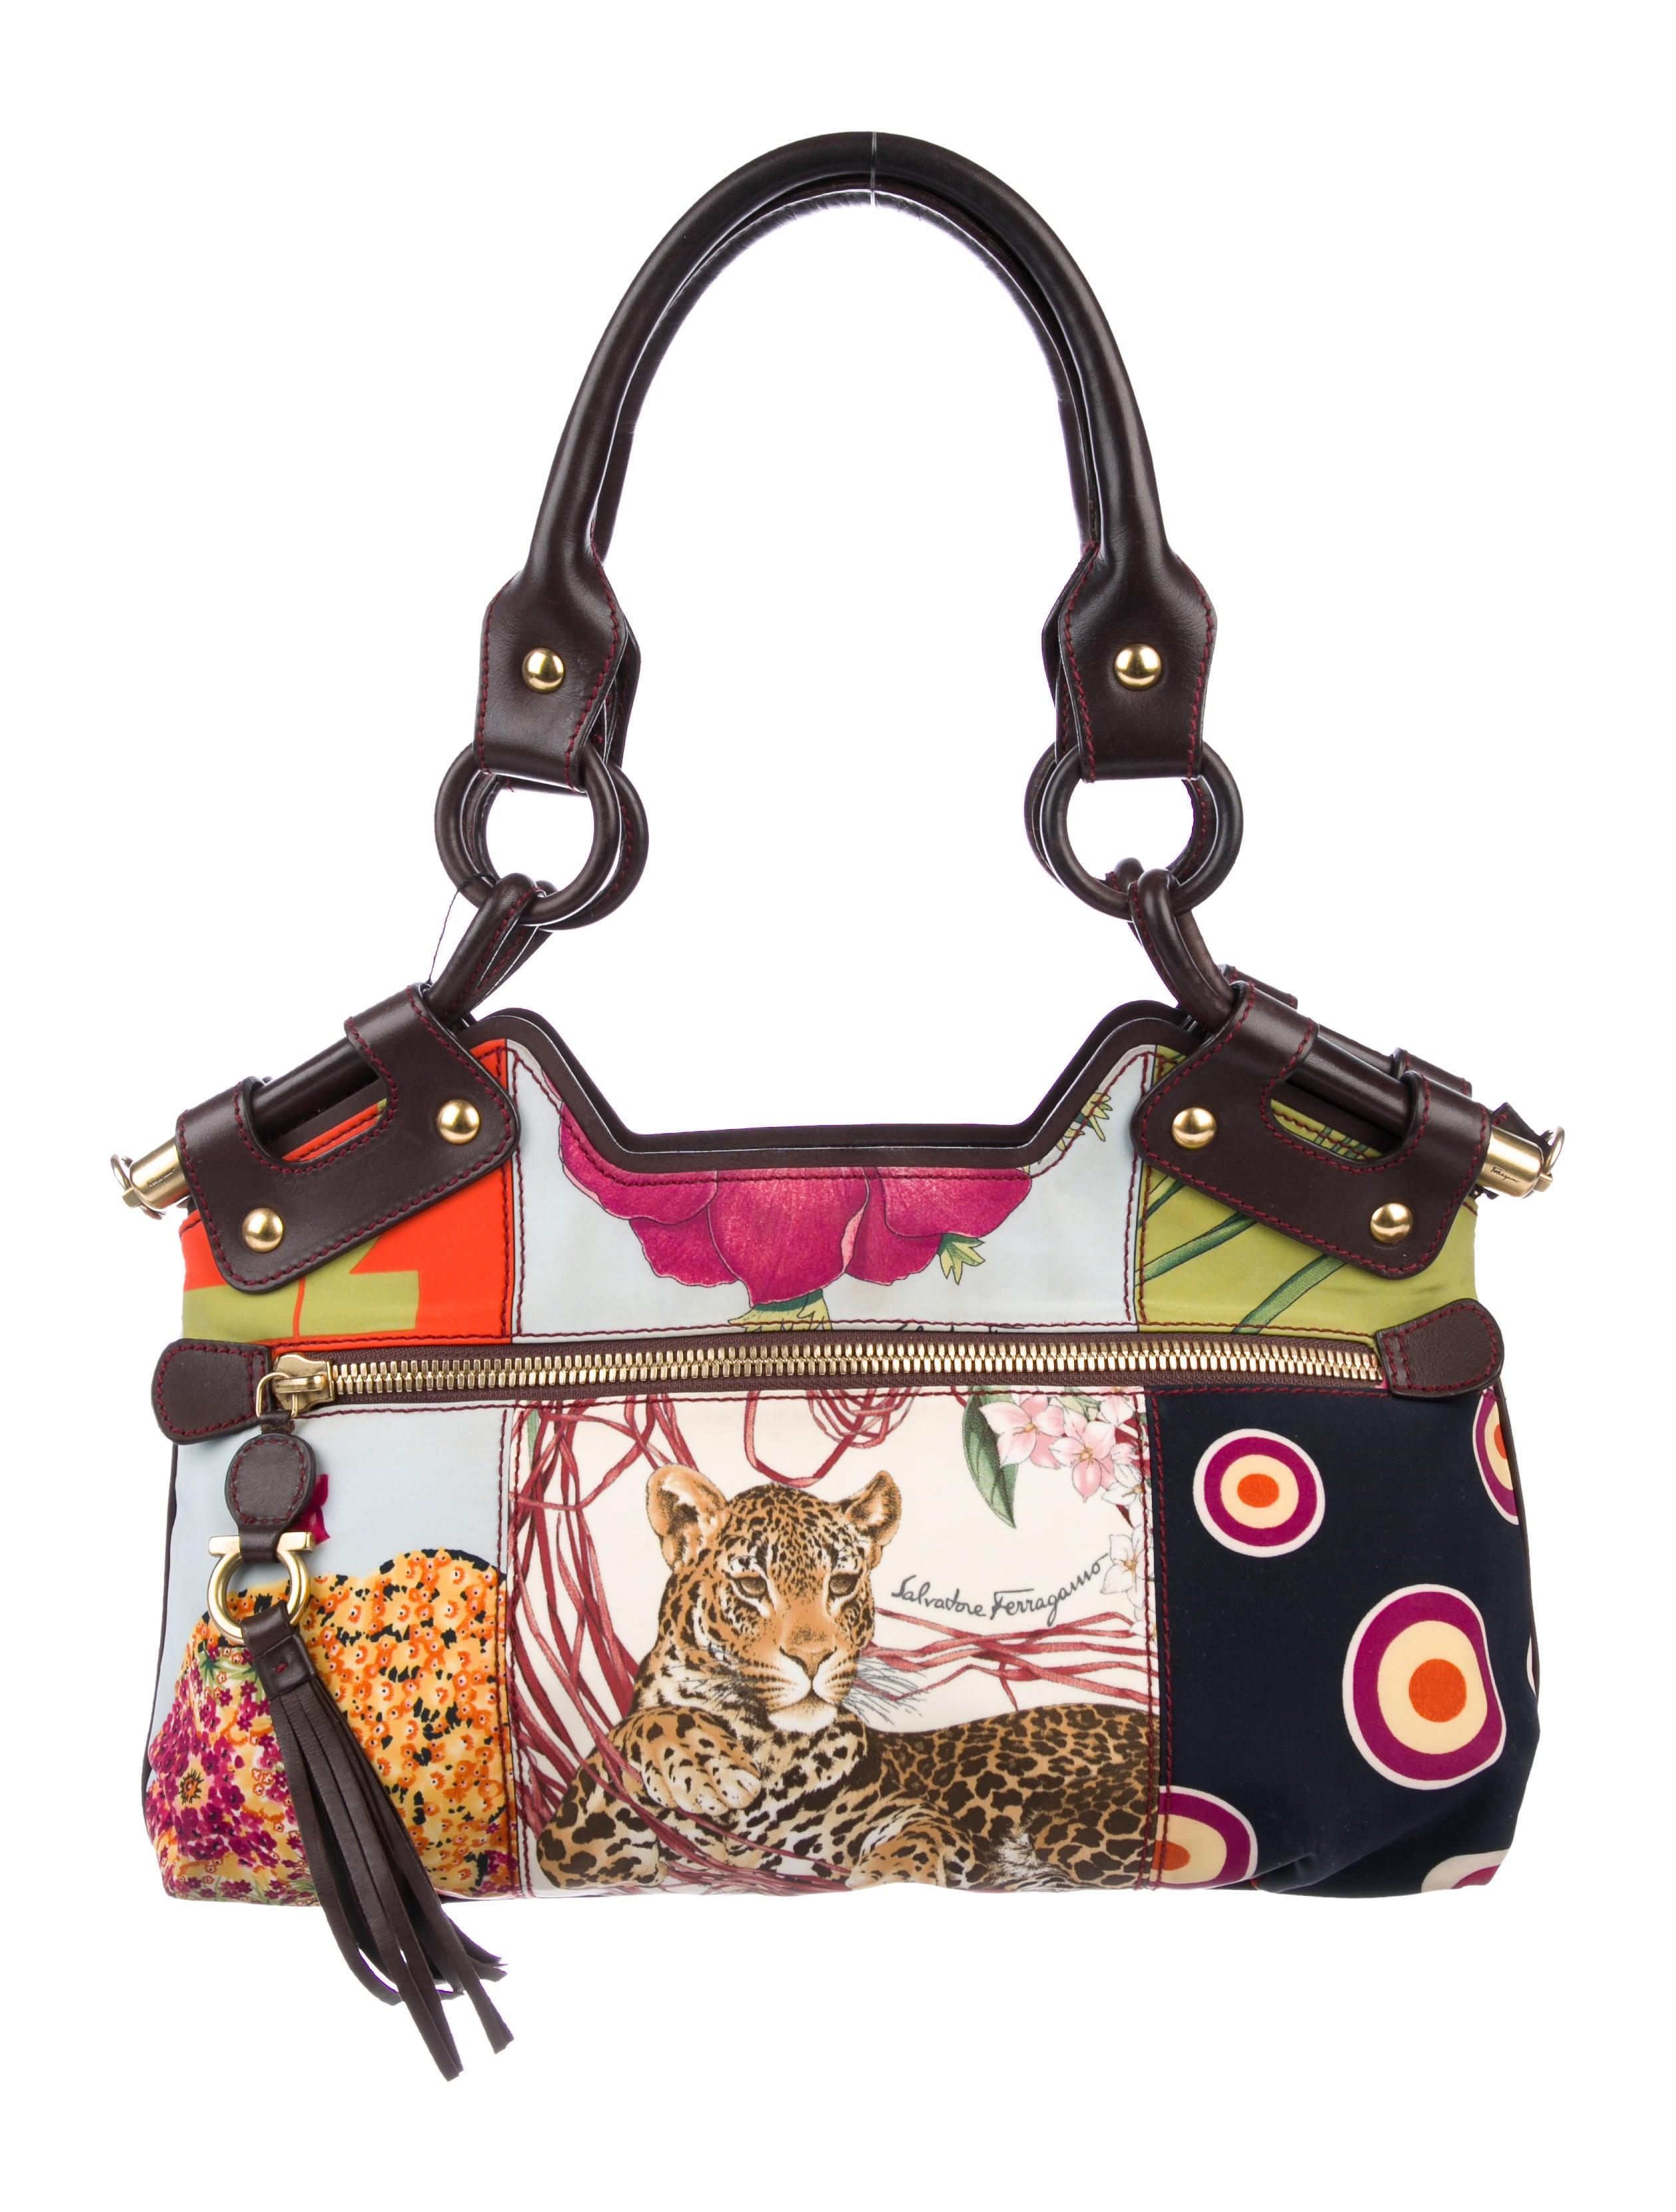 676ee50efd08 Salvatore Ferragamo Leather-Trimmed Printed Shoulder Bag - Handbags ...